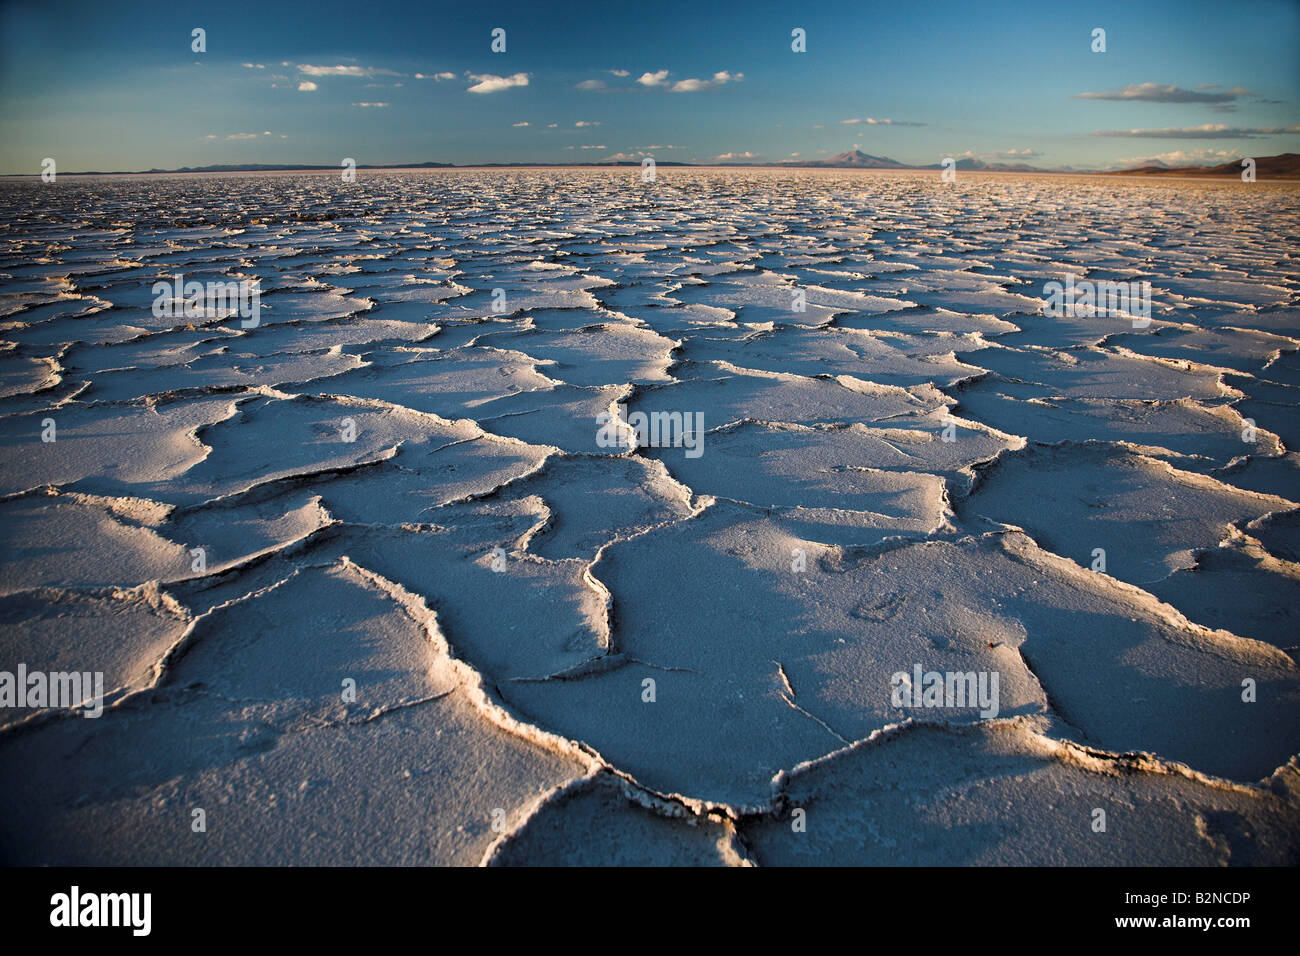 Erdoberfläche bei Sonnenaufgang in dem Salzsee Salar de Uyuni in Bolivien geknackt. Stockbild